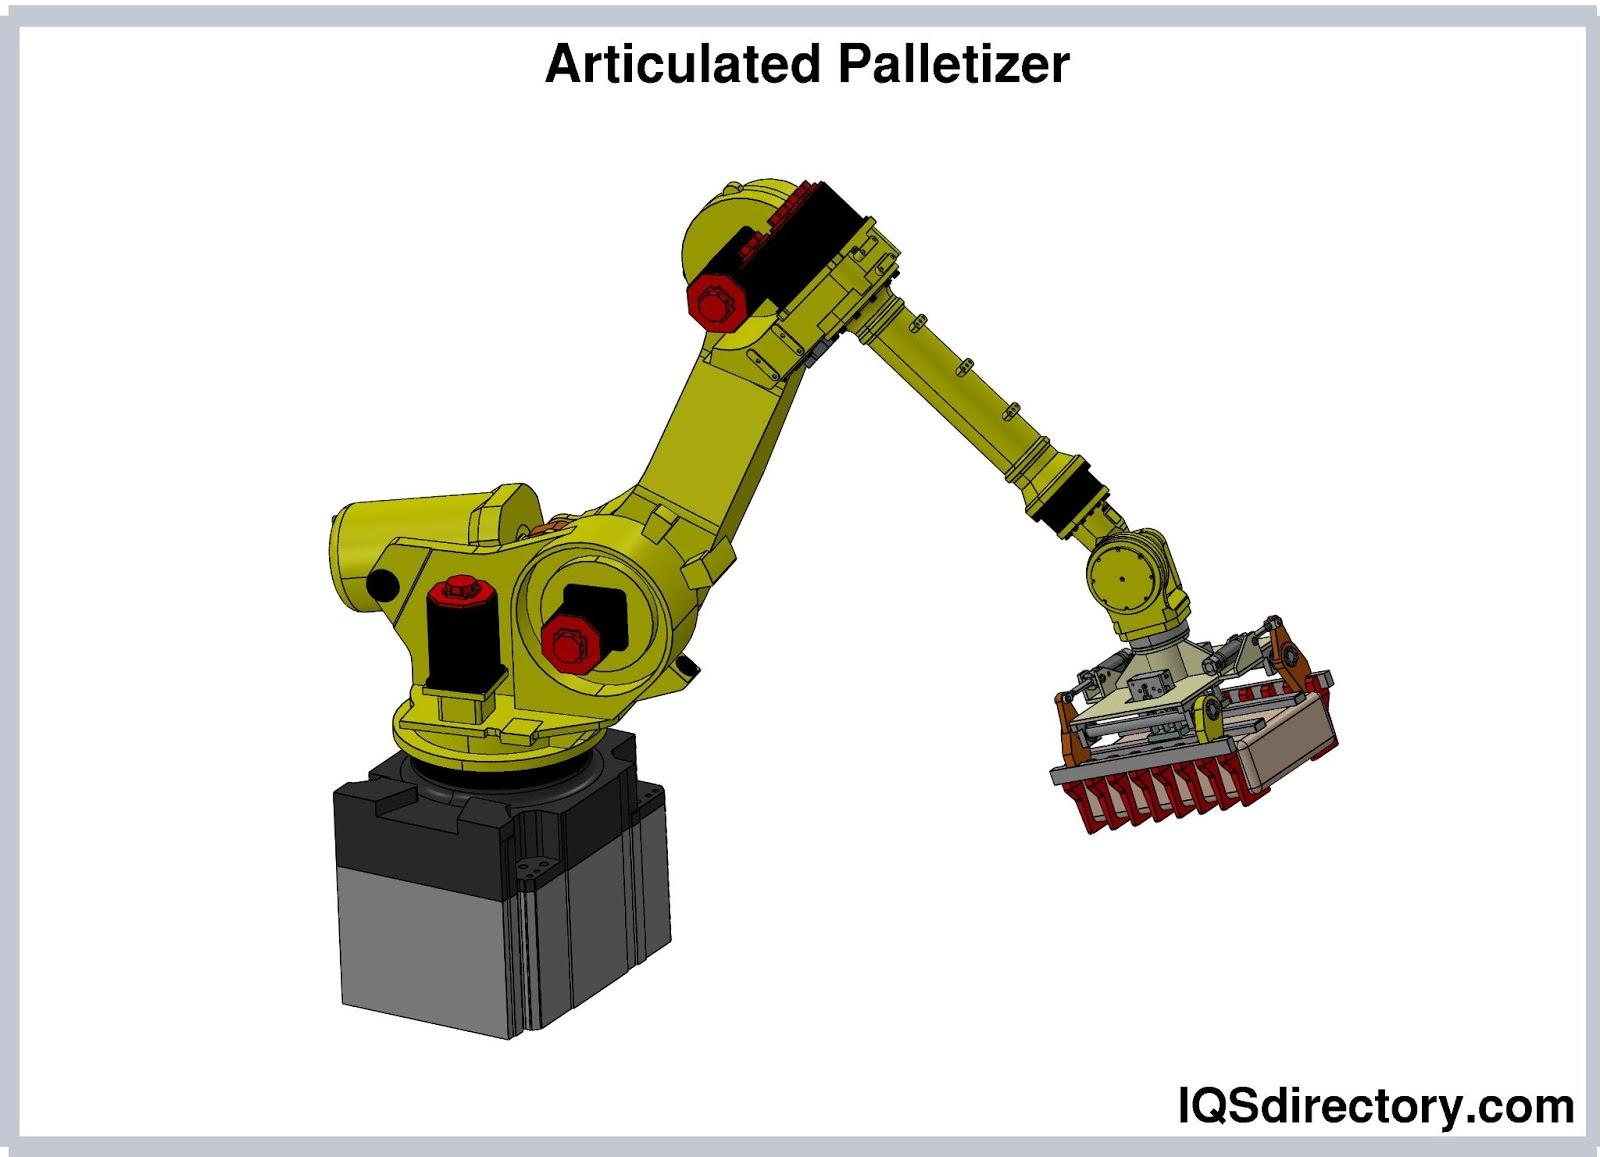 Articulated Palletizer